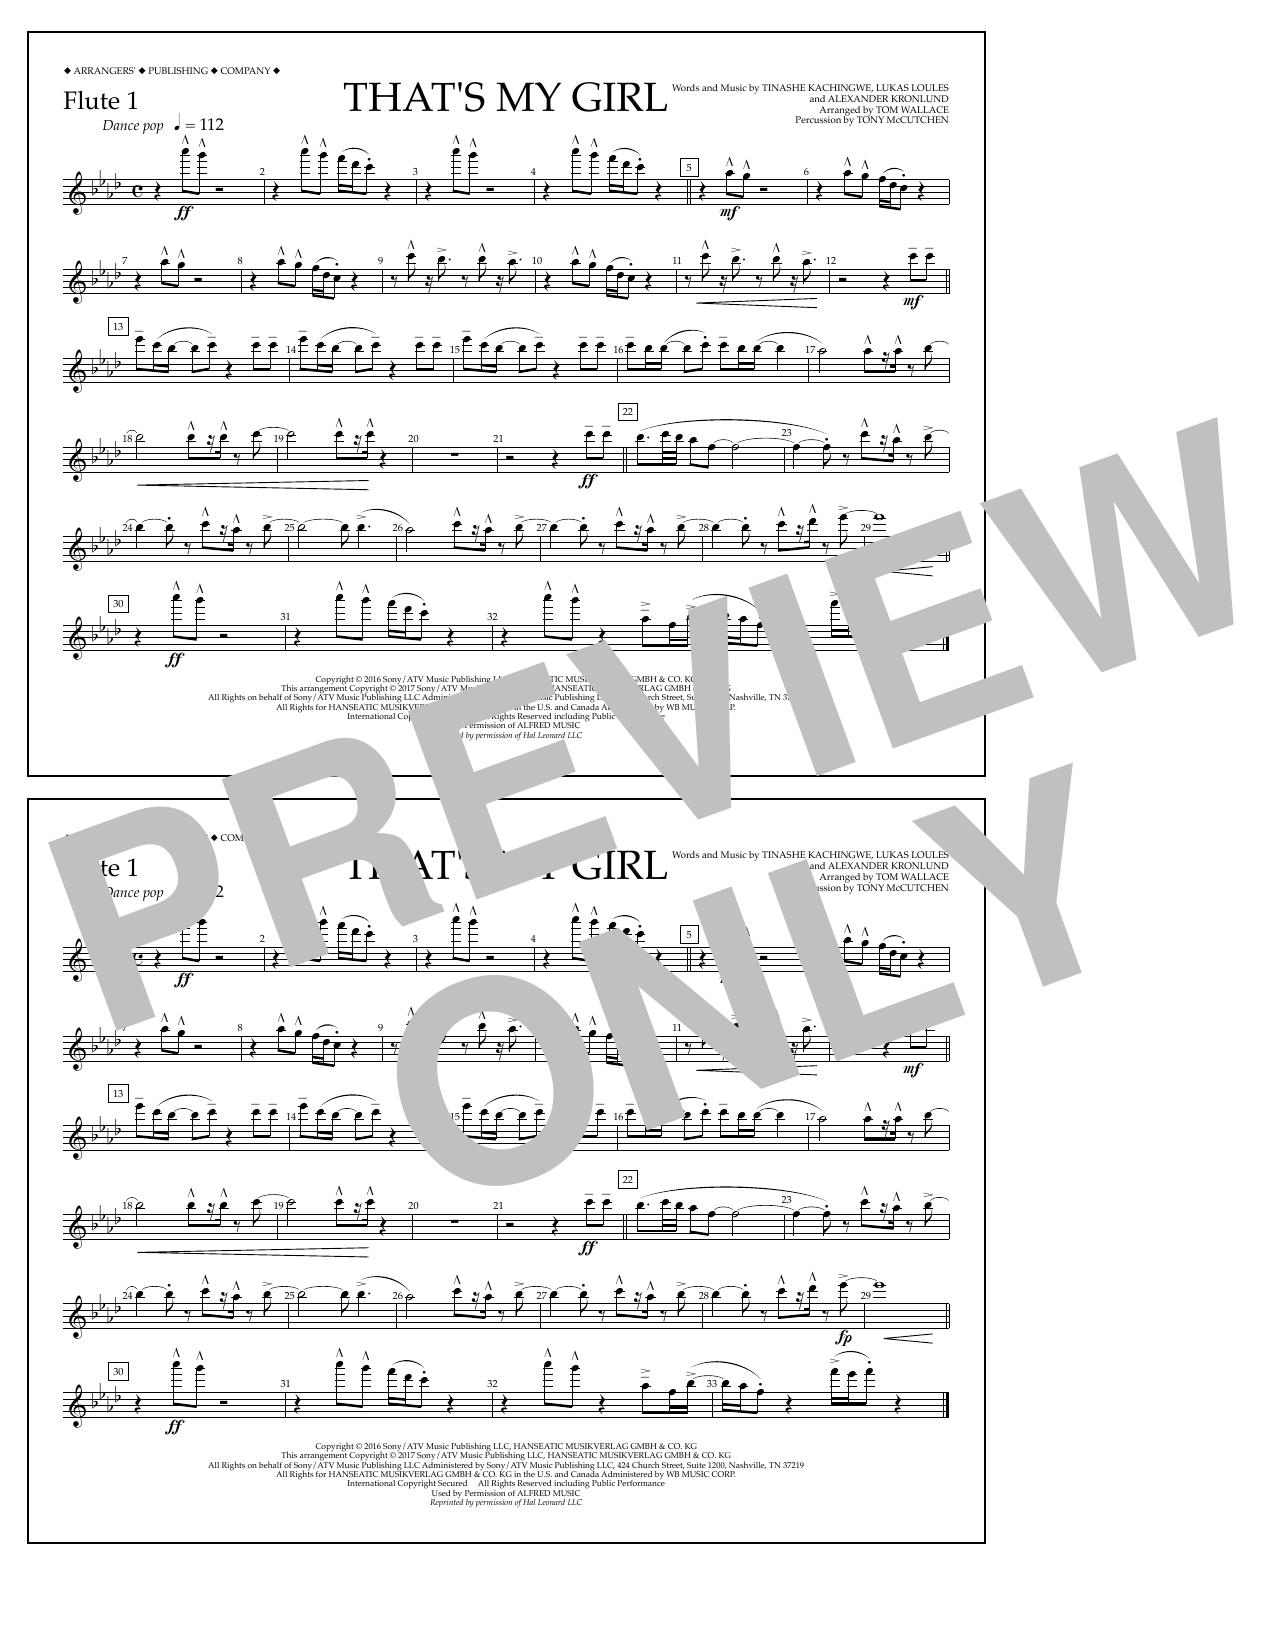 That's My Girl - Flute 1 Sheet Music